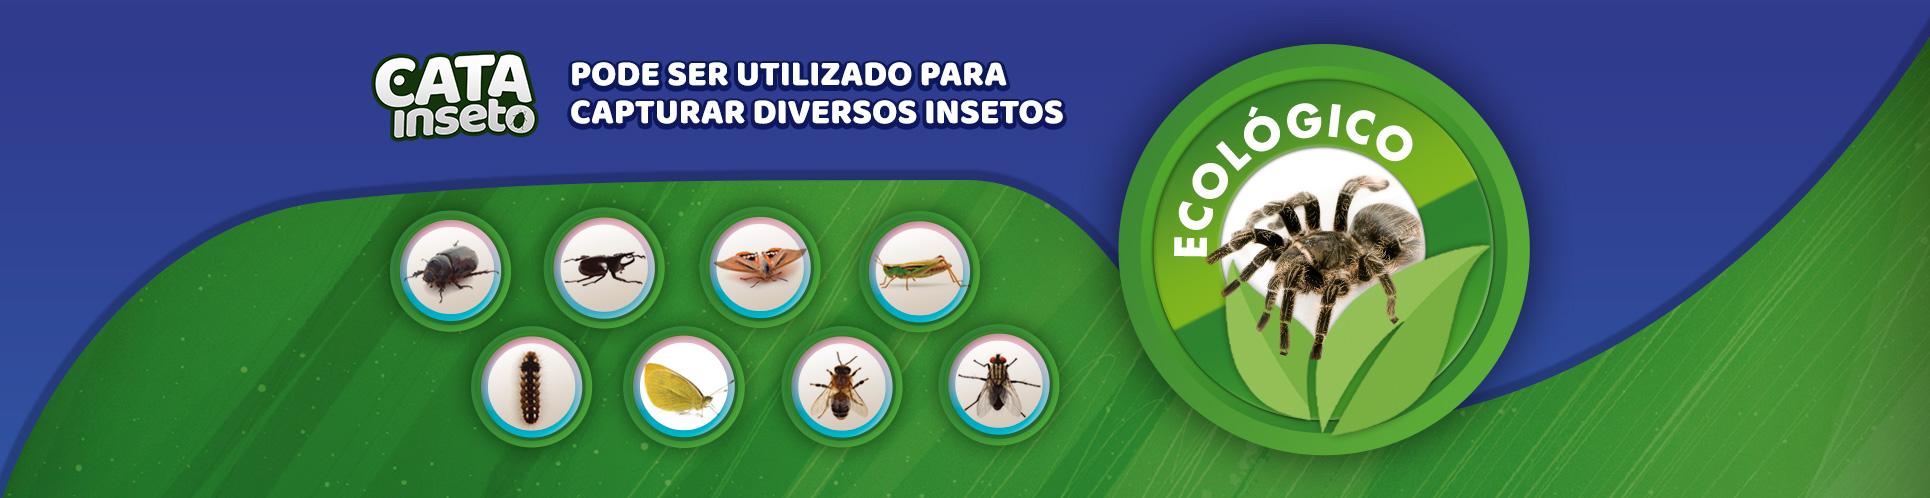 Tipo de inseto